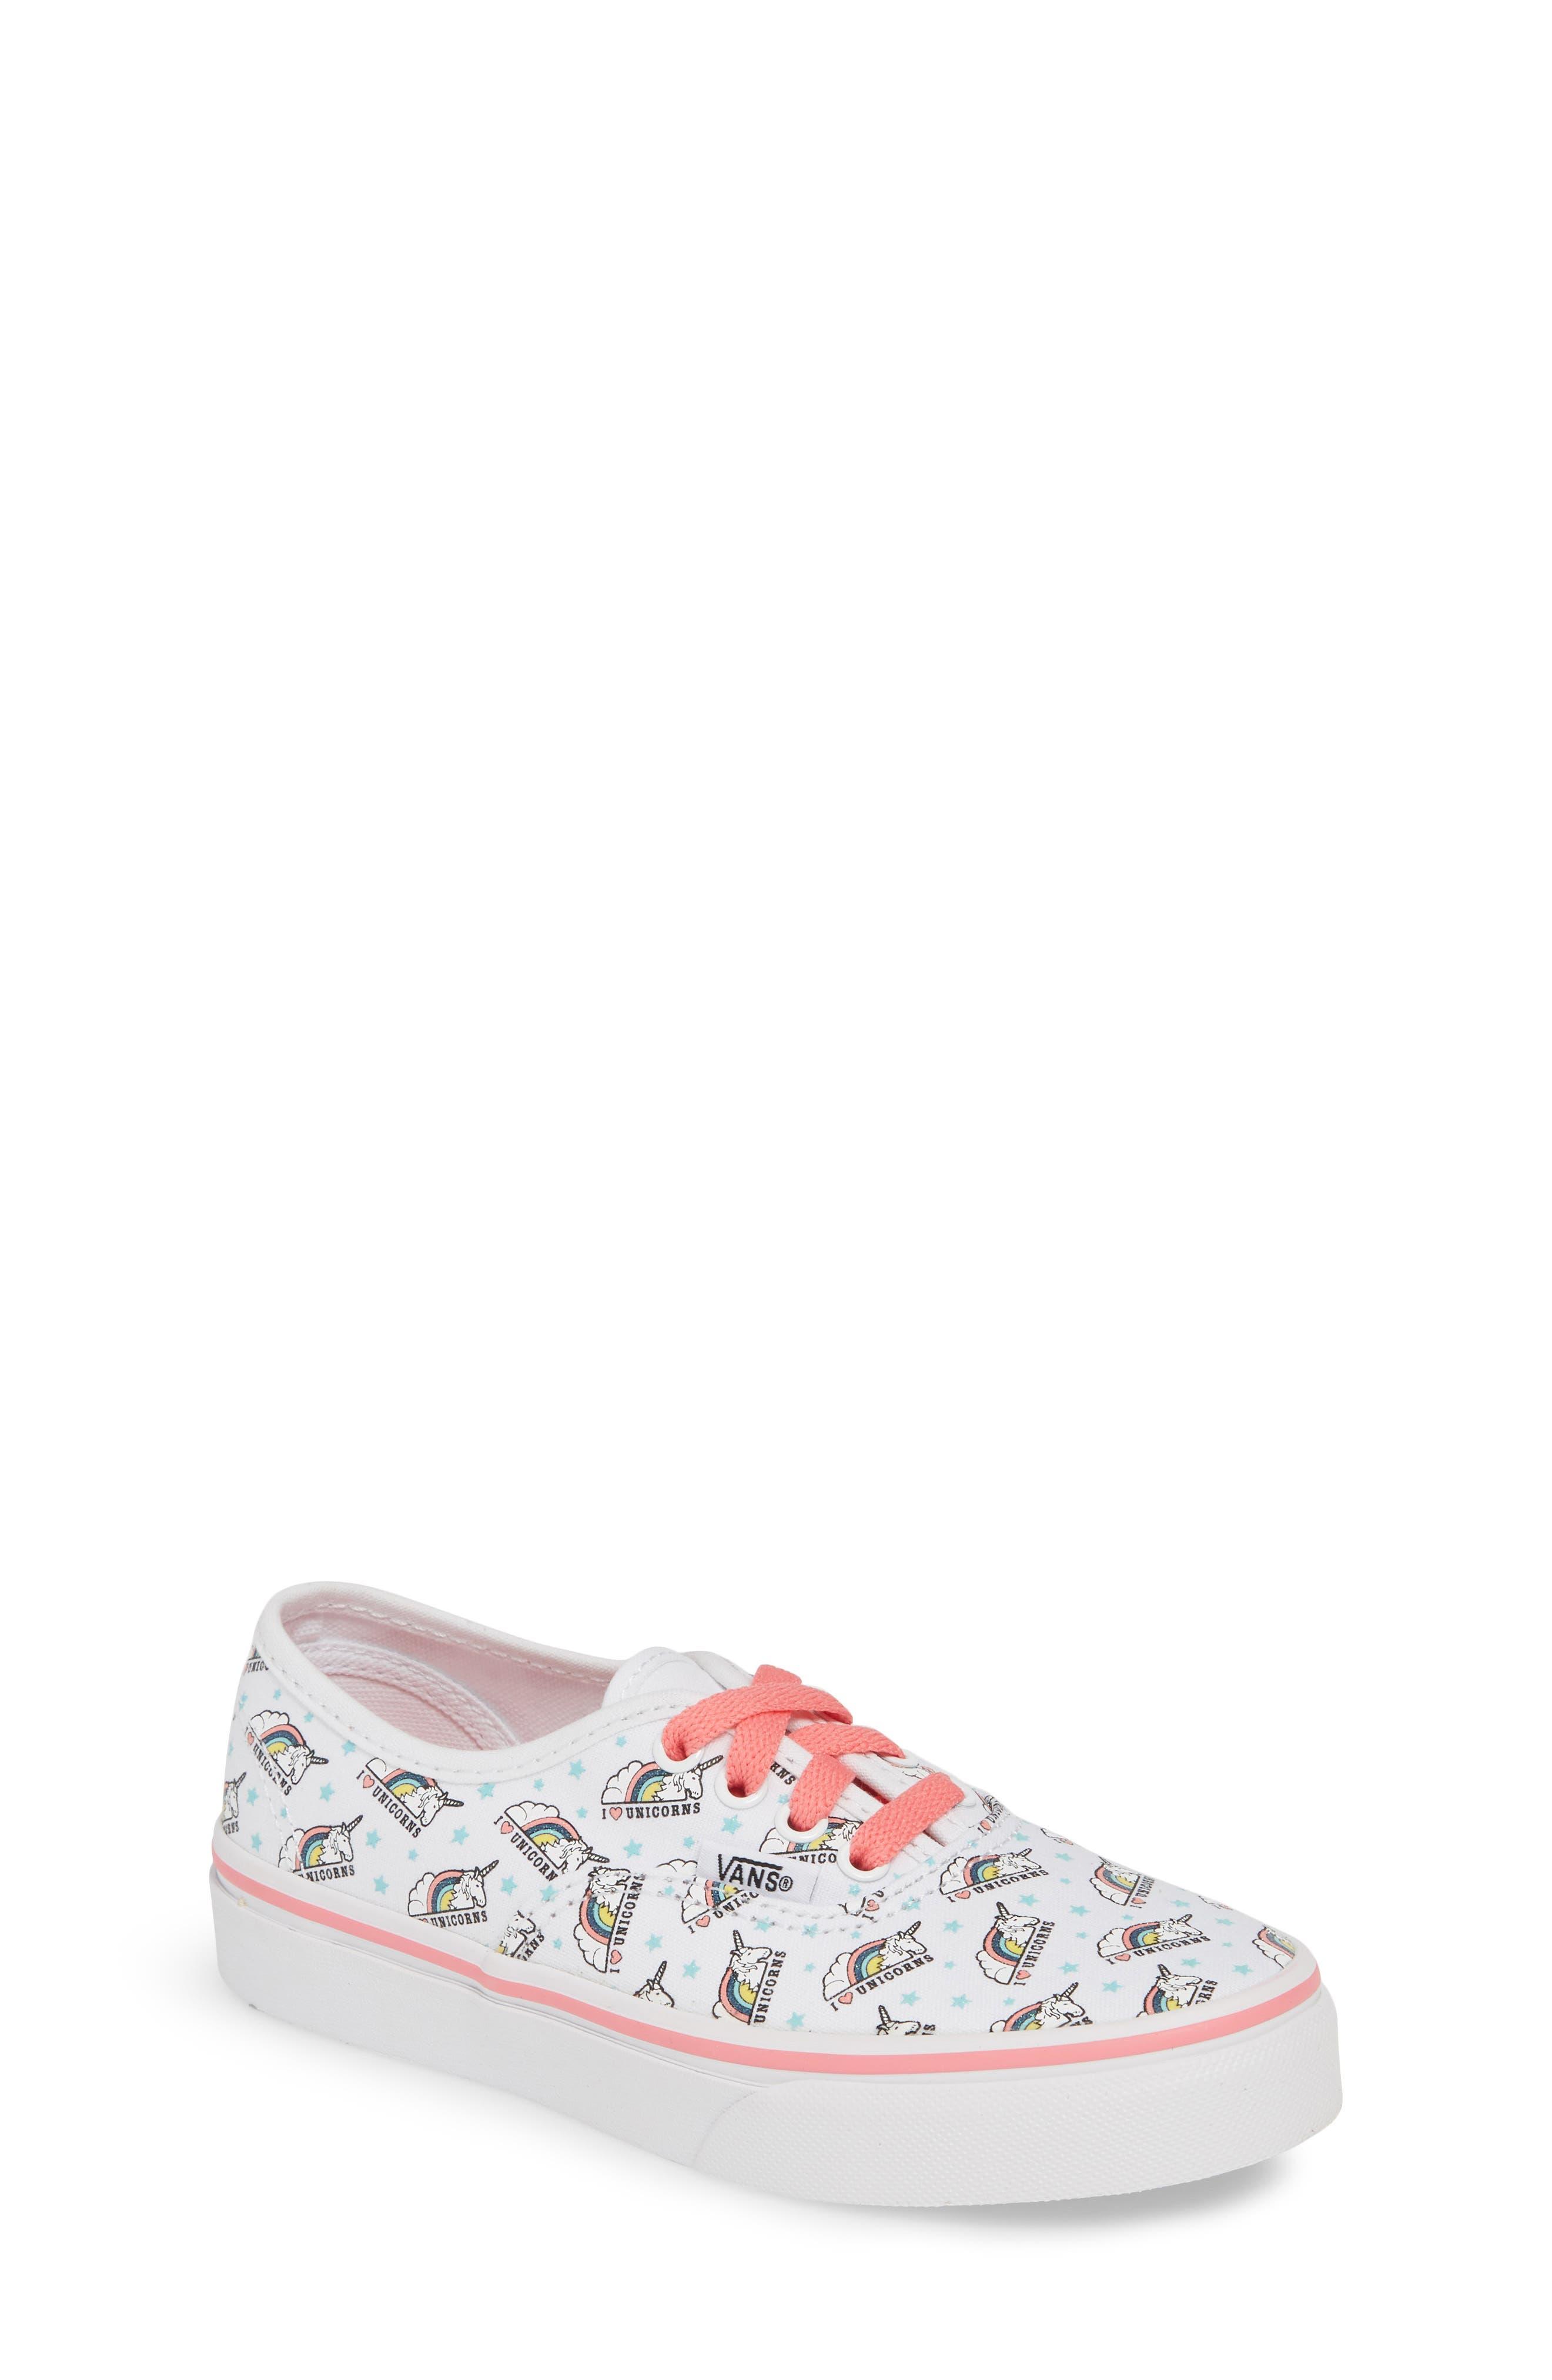 ed6162ec9742a9 Kid s Vans  Authentic  Sneaker